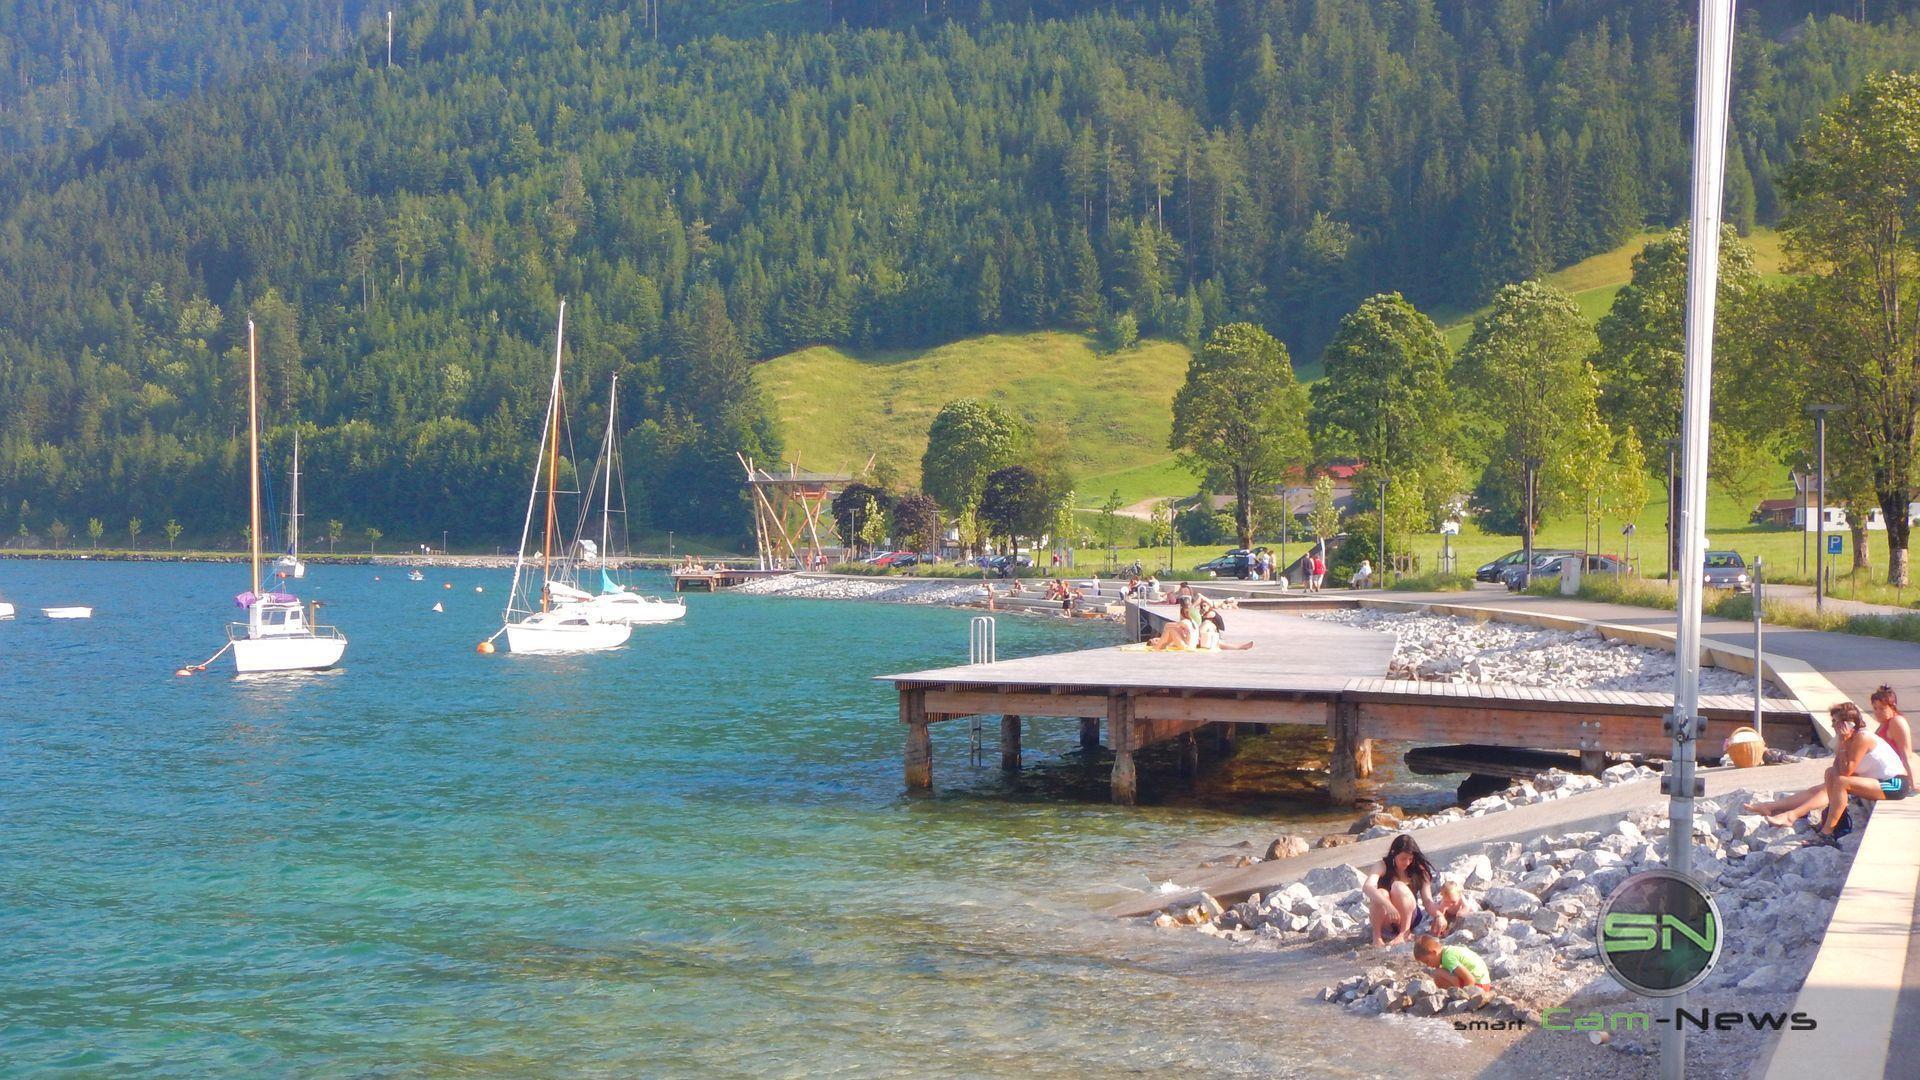 am Steg Achensee Tirol - Nikon AW130 - SmartCamNews